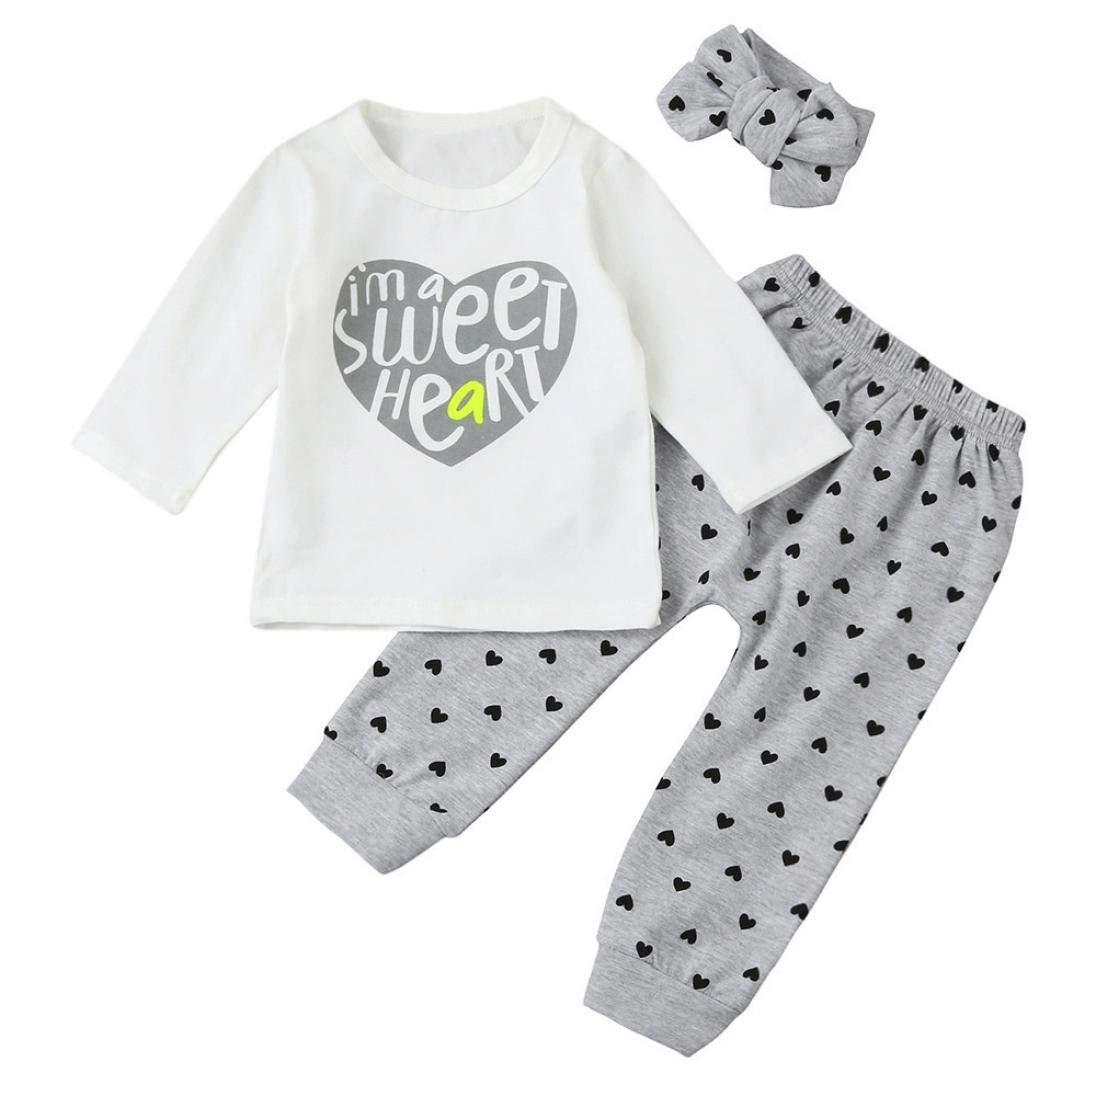 Newborn Autumn Letter Sets,Jchen(TM) Toddler Infant Baby Girl Boy Long Sleeve Letter Sweet Heart Print Tops Heart Pants Headband Outfits for 0-24 Months (Age: 12-18 Months)